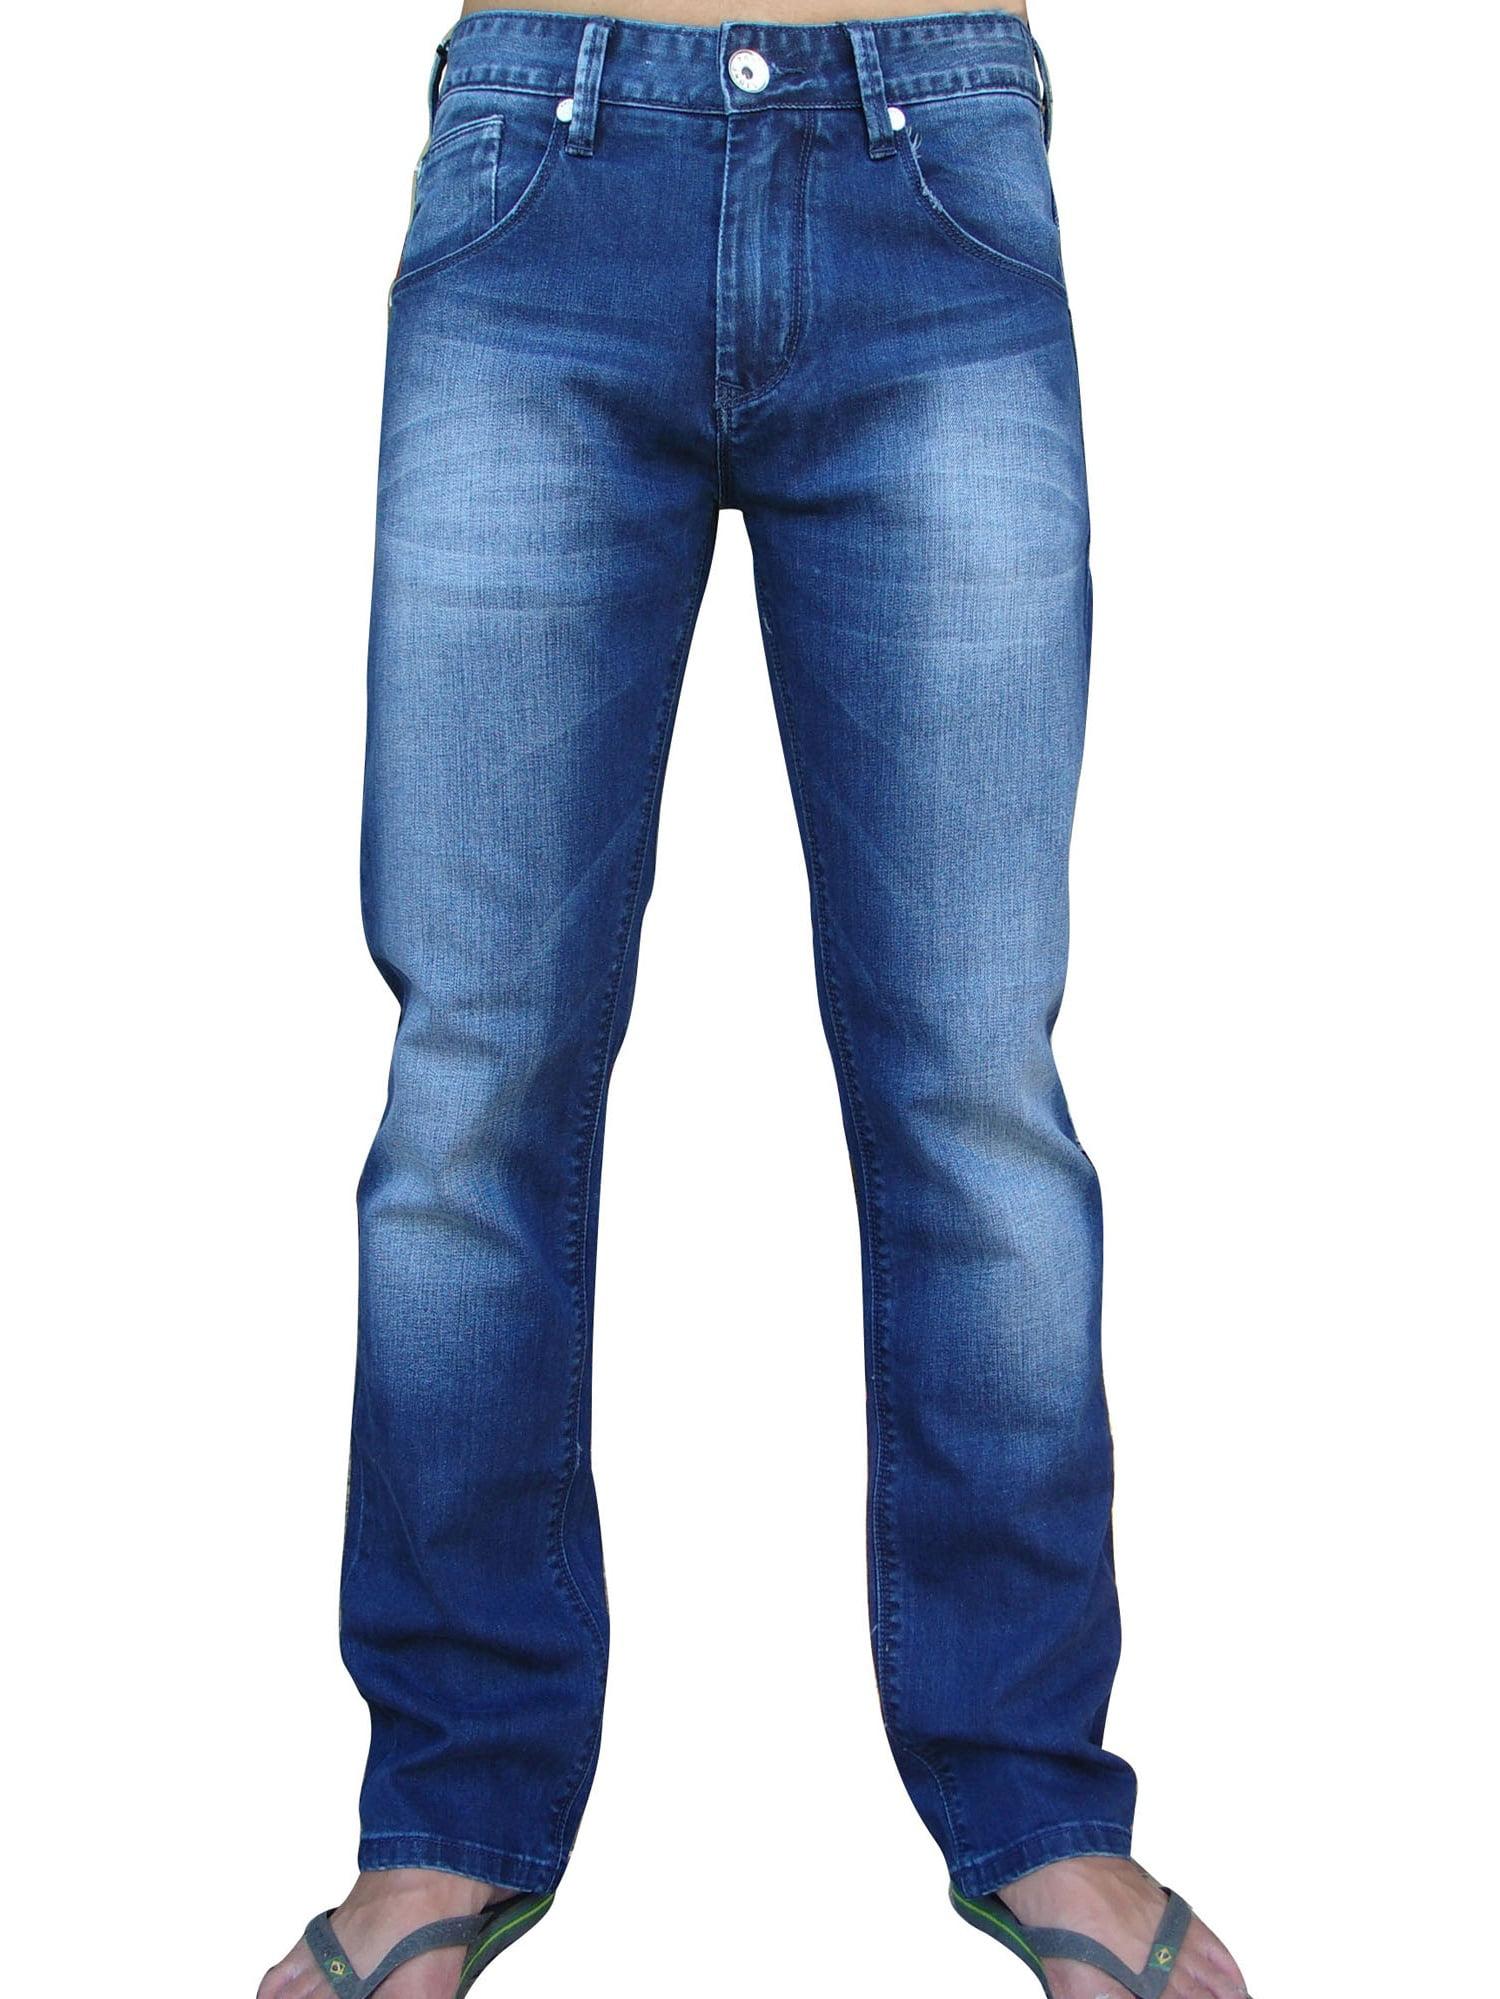 StoneTouch Men's Regular Fit Jeans 301-30s